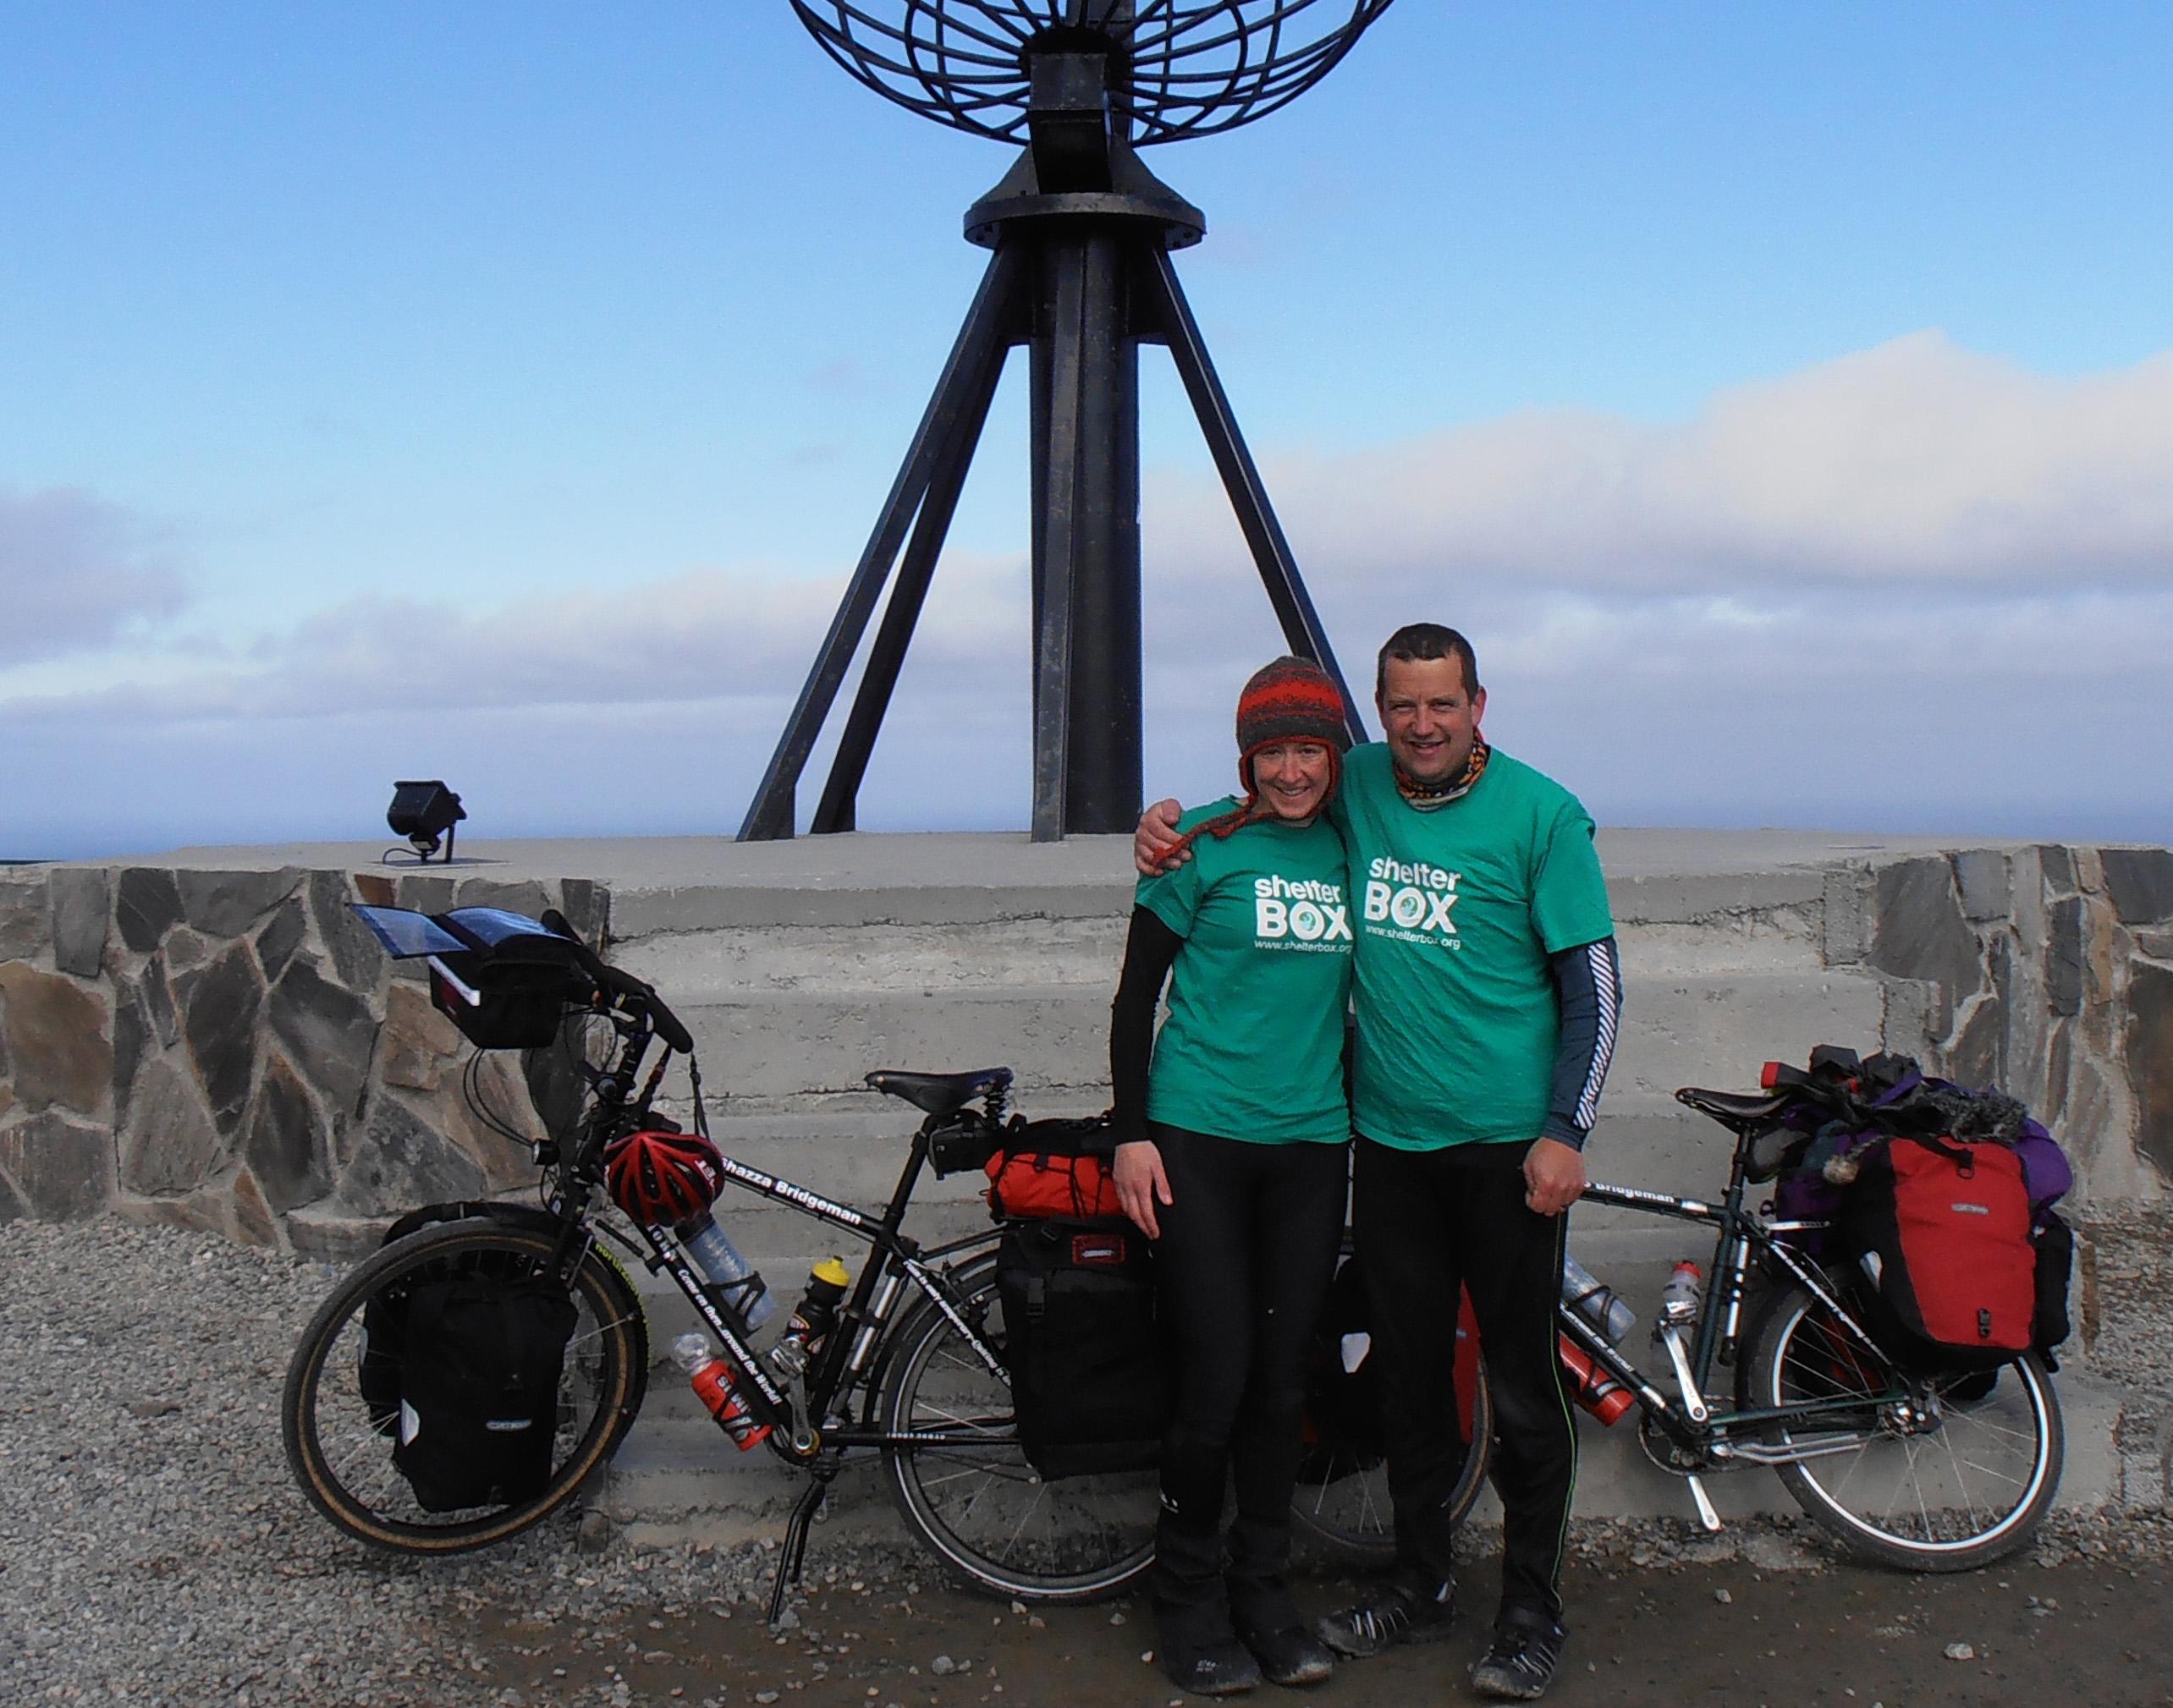 Tim and Sharon Bridgman start their journey in Norway